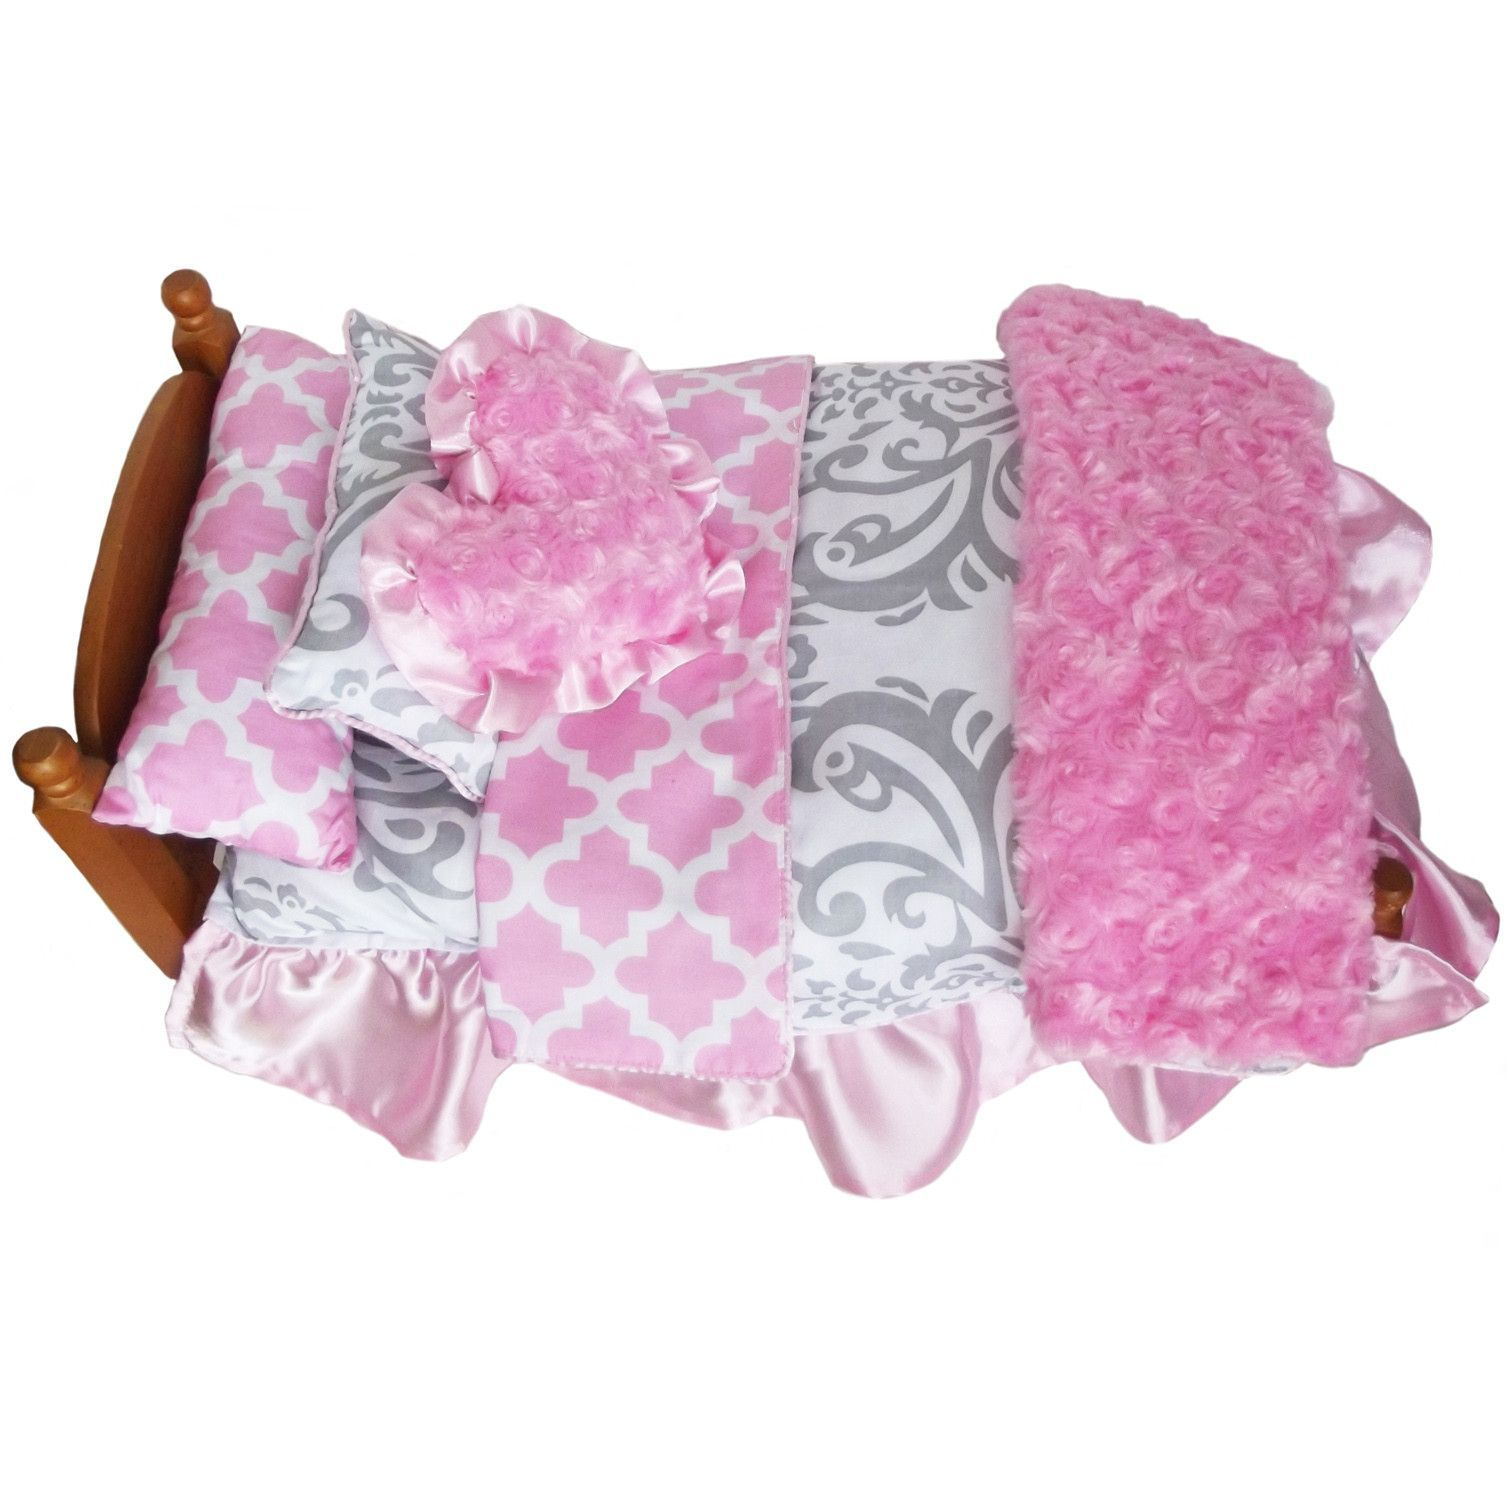 "AnnLoren 7-Pc Pink Lattice & Grey Bedding Set For American Girl and 17"" Dolls - $29.99 through link! #americangirl #dolls"